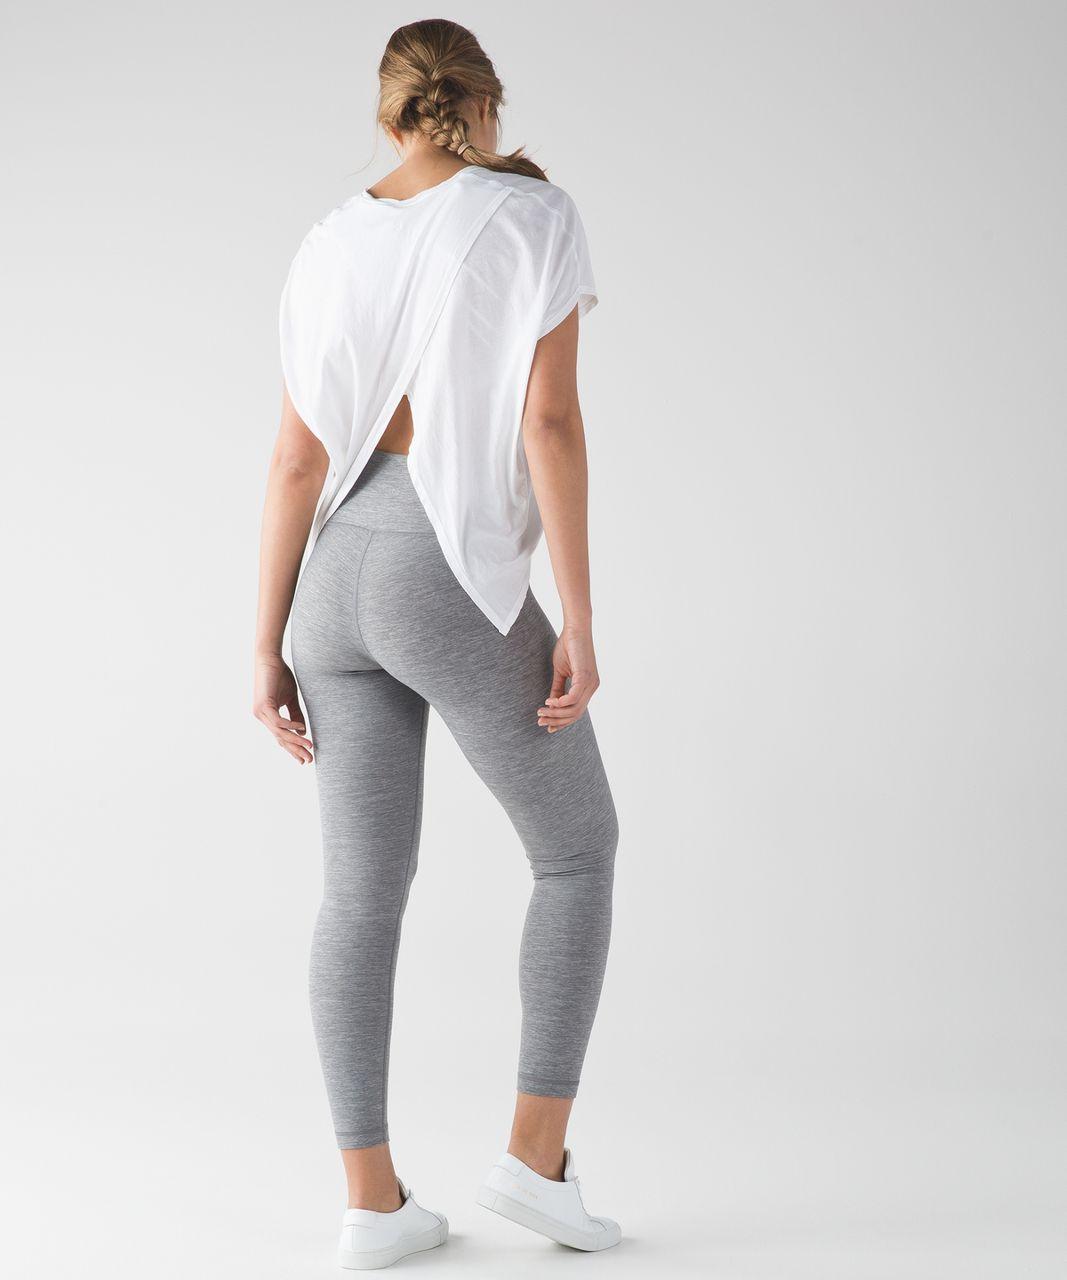 Lululemon High Times Pant - Heathered Slate